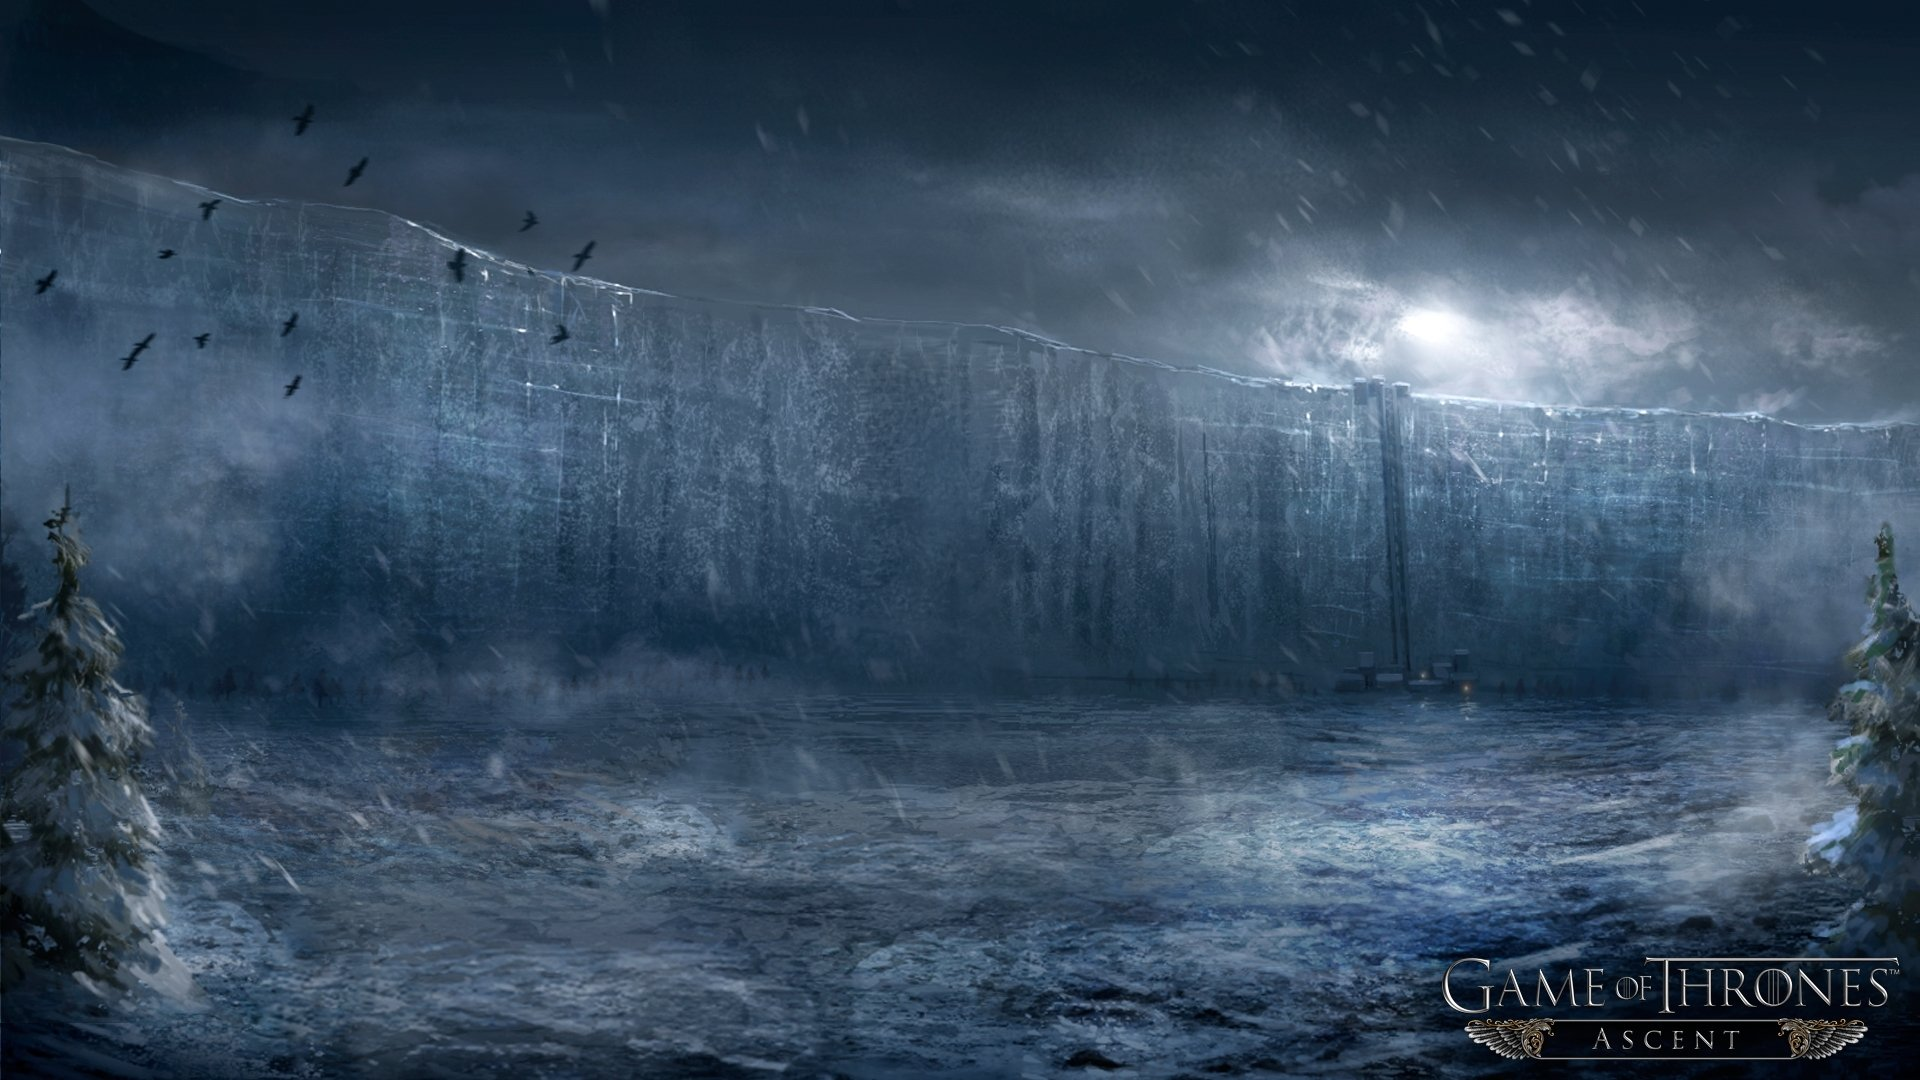 TV Show - Game Of Thrones  Wallpaper